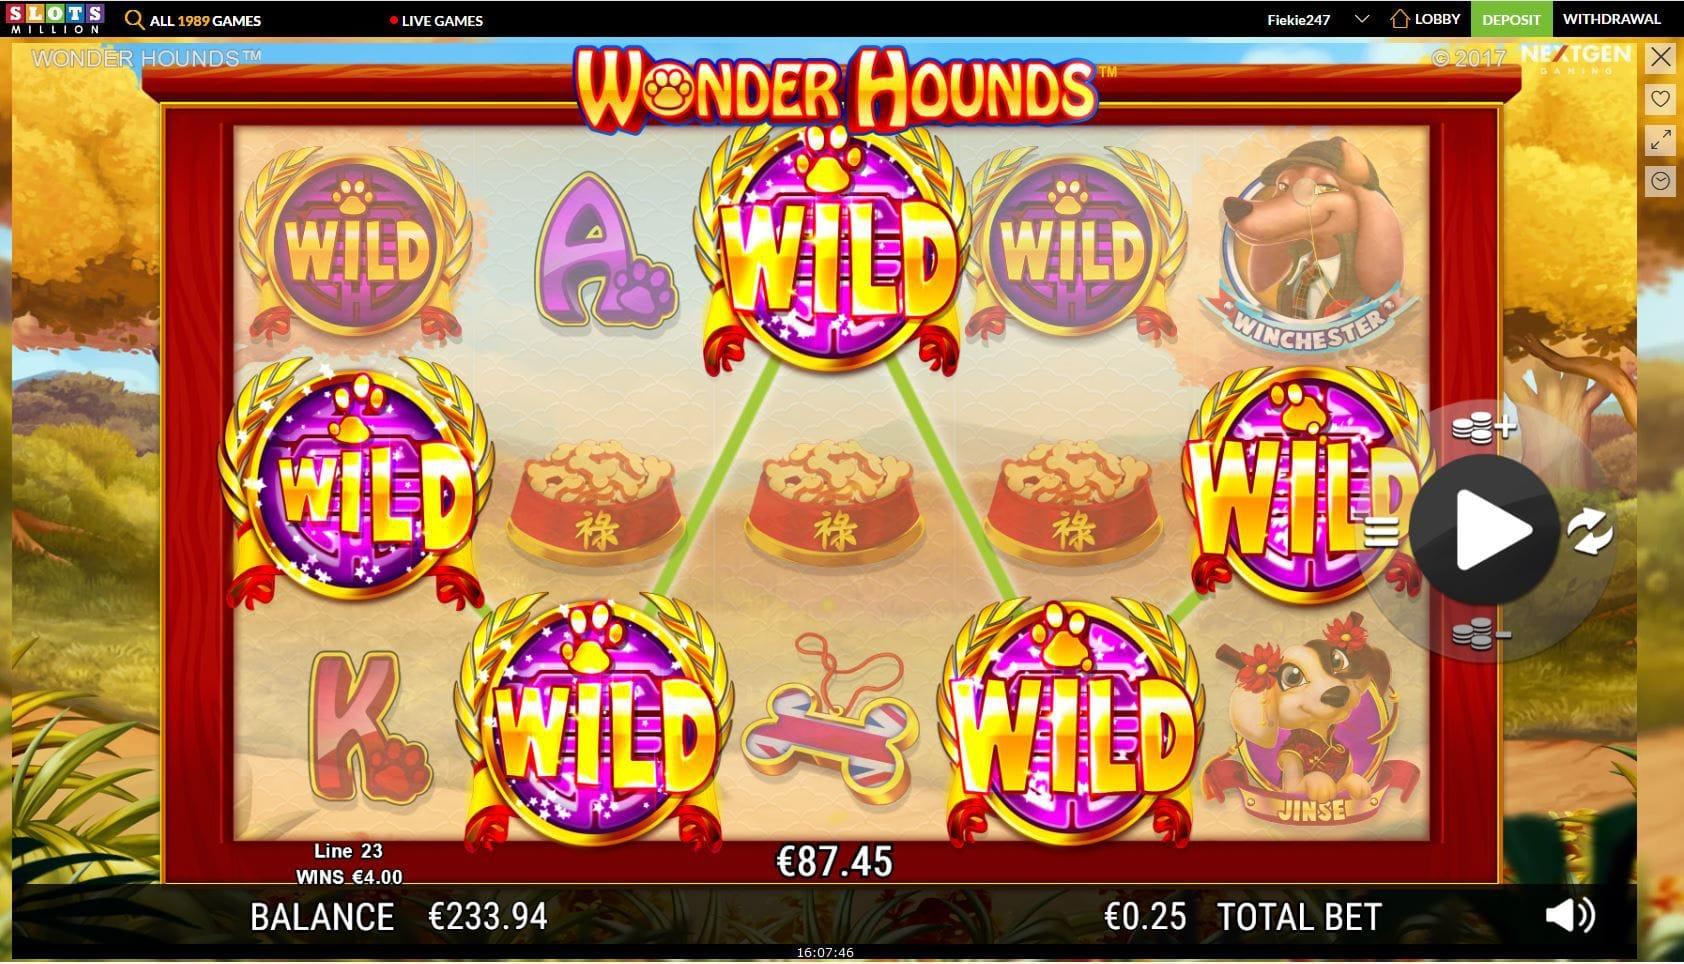 Wonder Hounds online slot gameplay